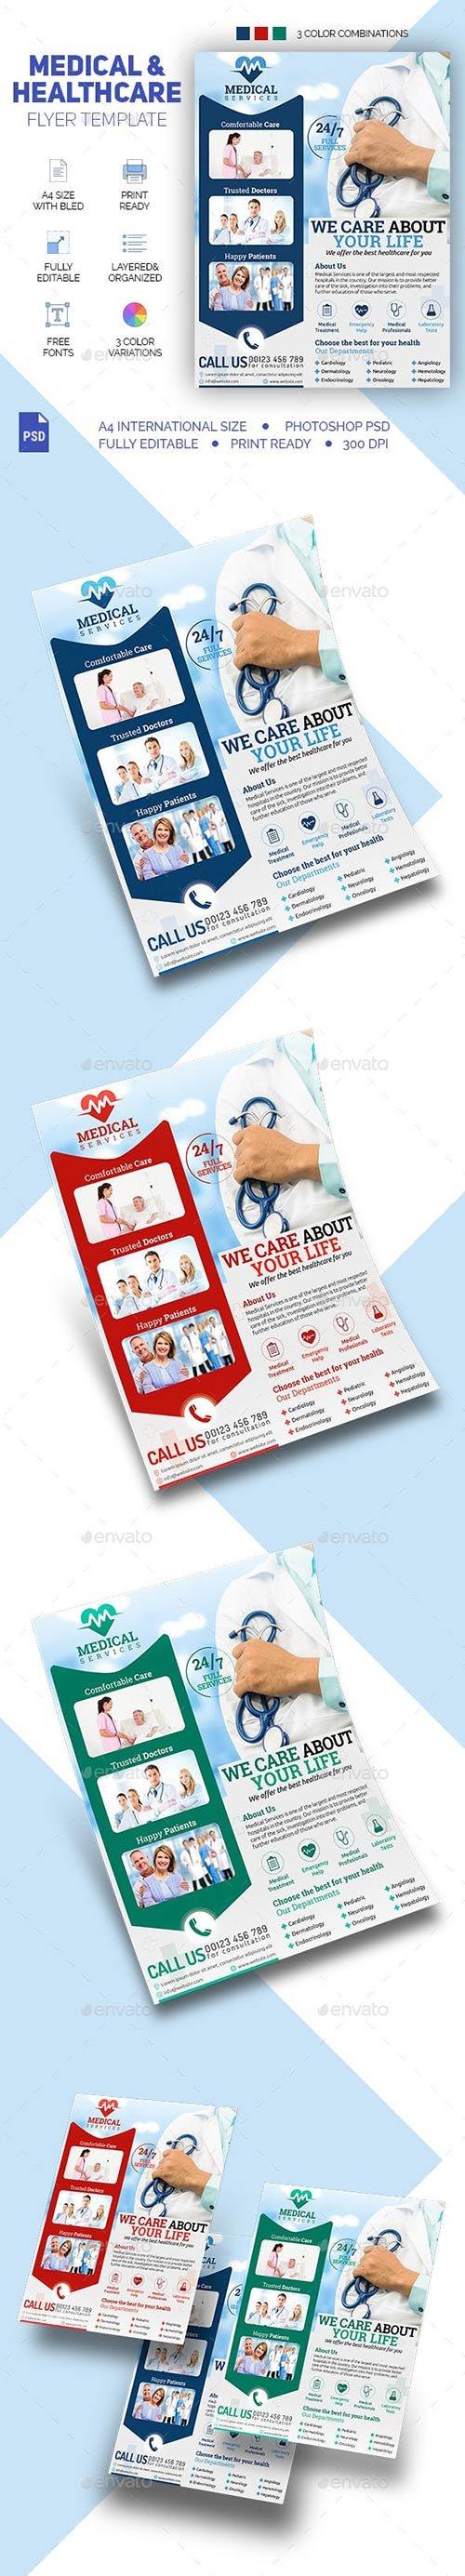 GraphicRiver - Medical & Healthcare Flyer 22730948